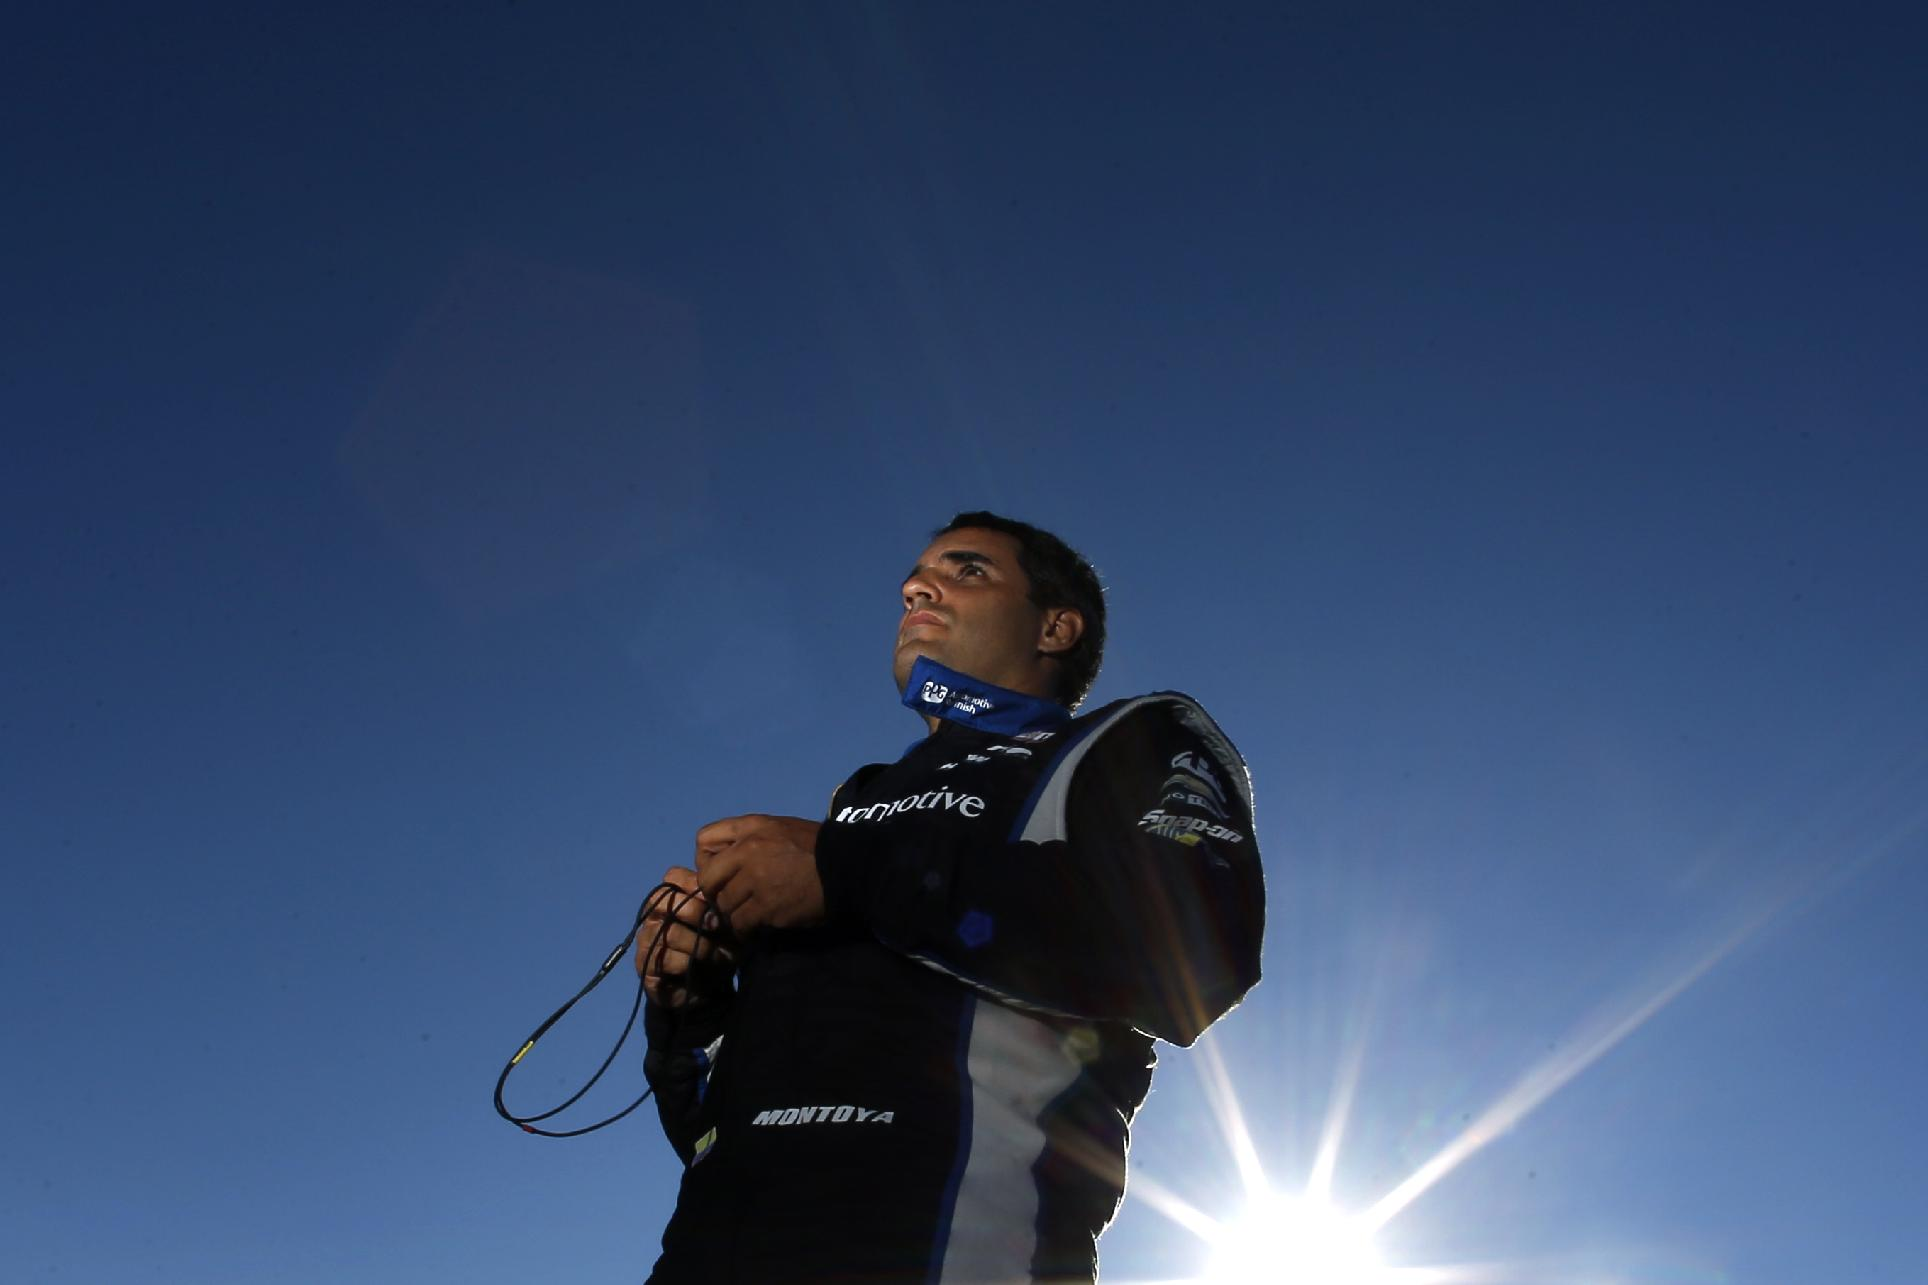 Montoya wins 1st IndyCar pole at Pocono Raceway